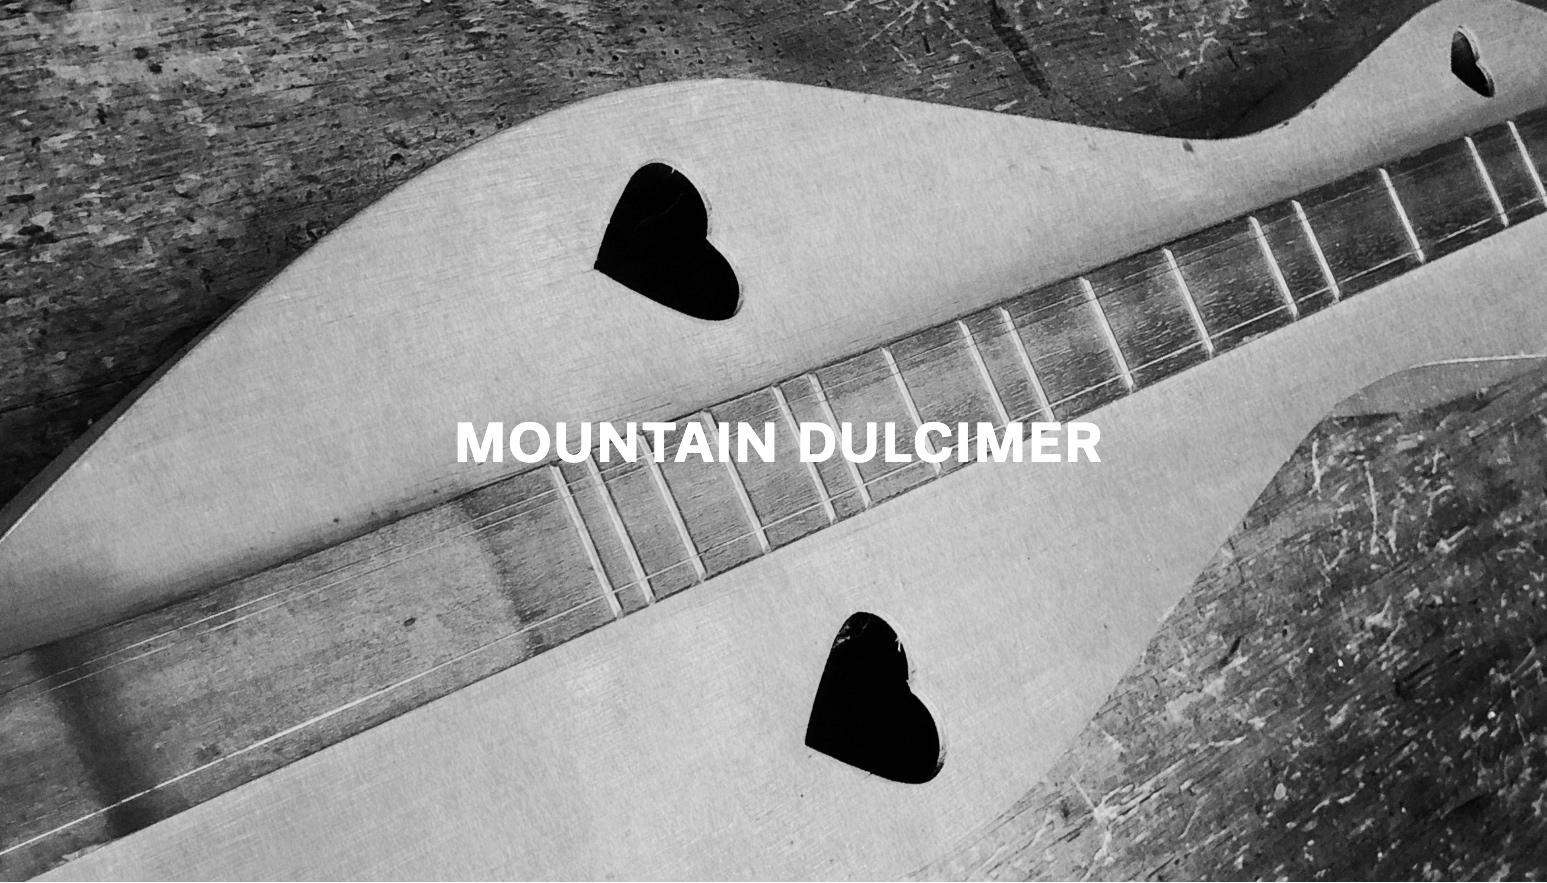 Mountain Dulcimer Text.jpg